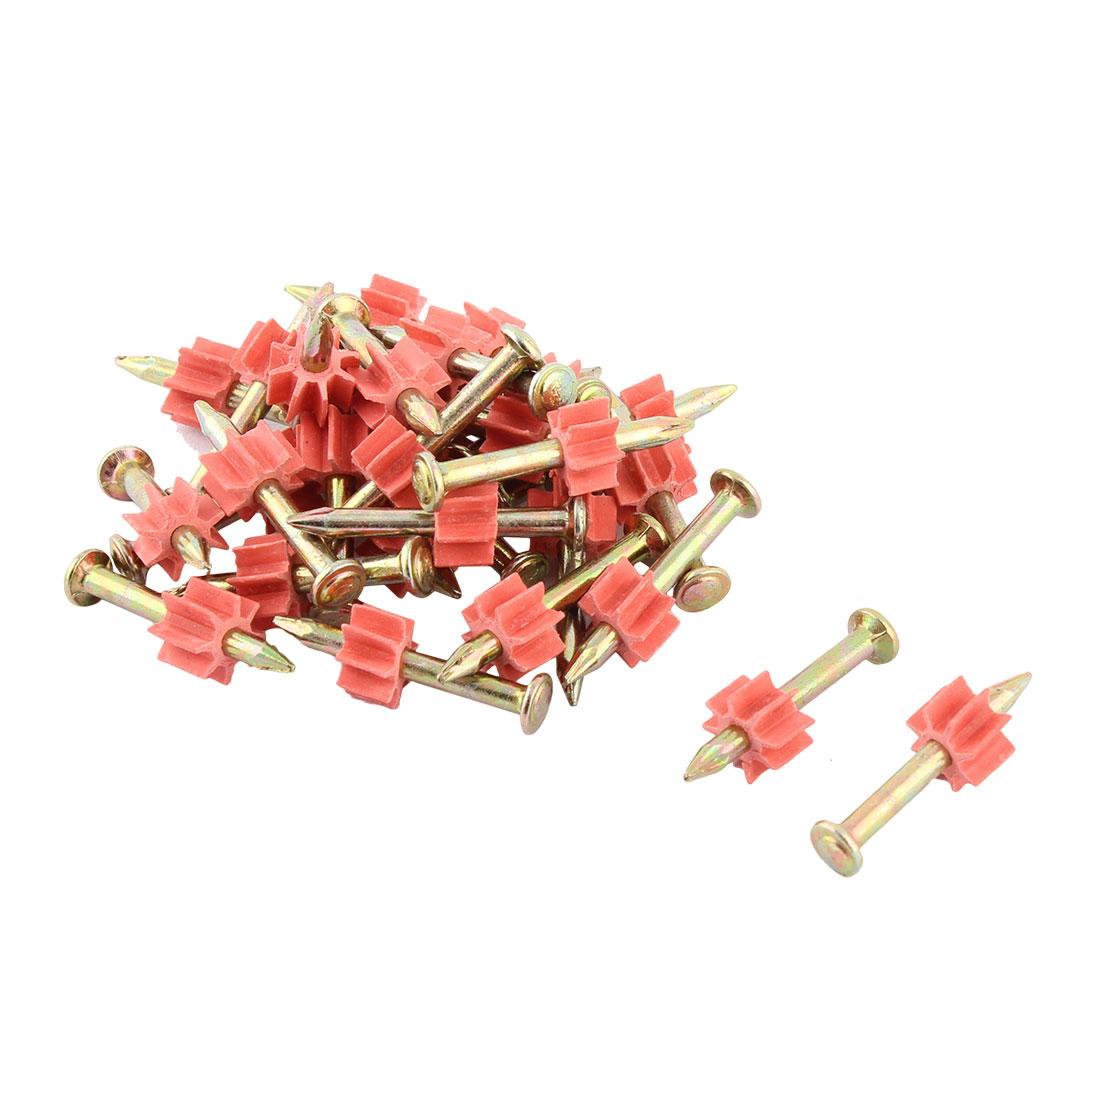 5.3mm Dia Shank 28mm Long Metal Power Hammer Drive Pins Fasteners Gold Tone Red 30 Pcs